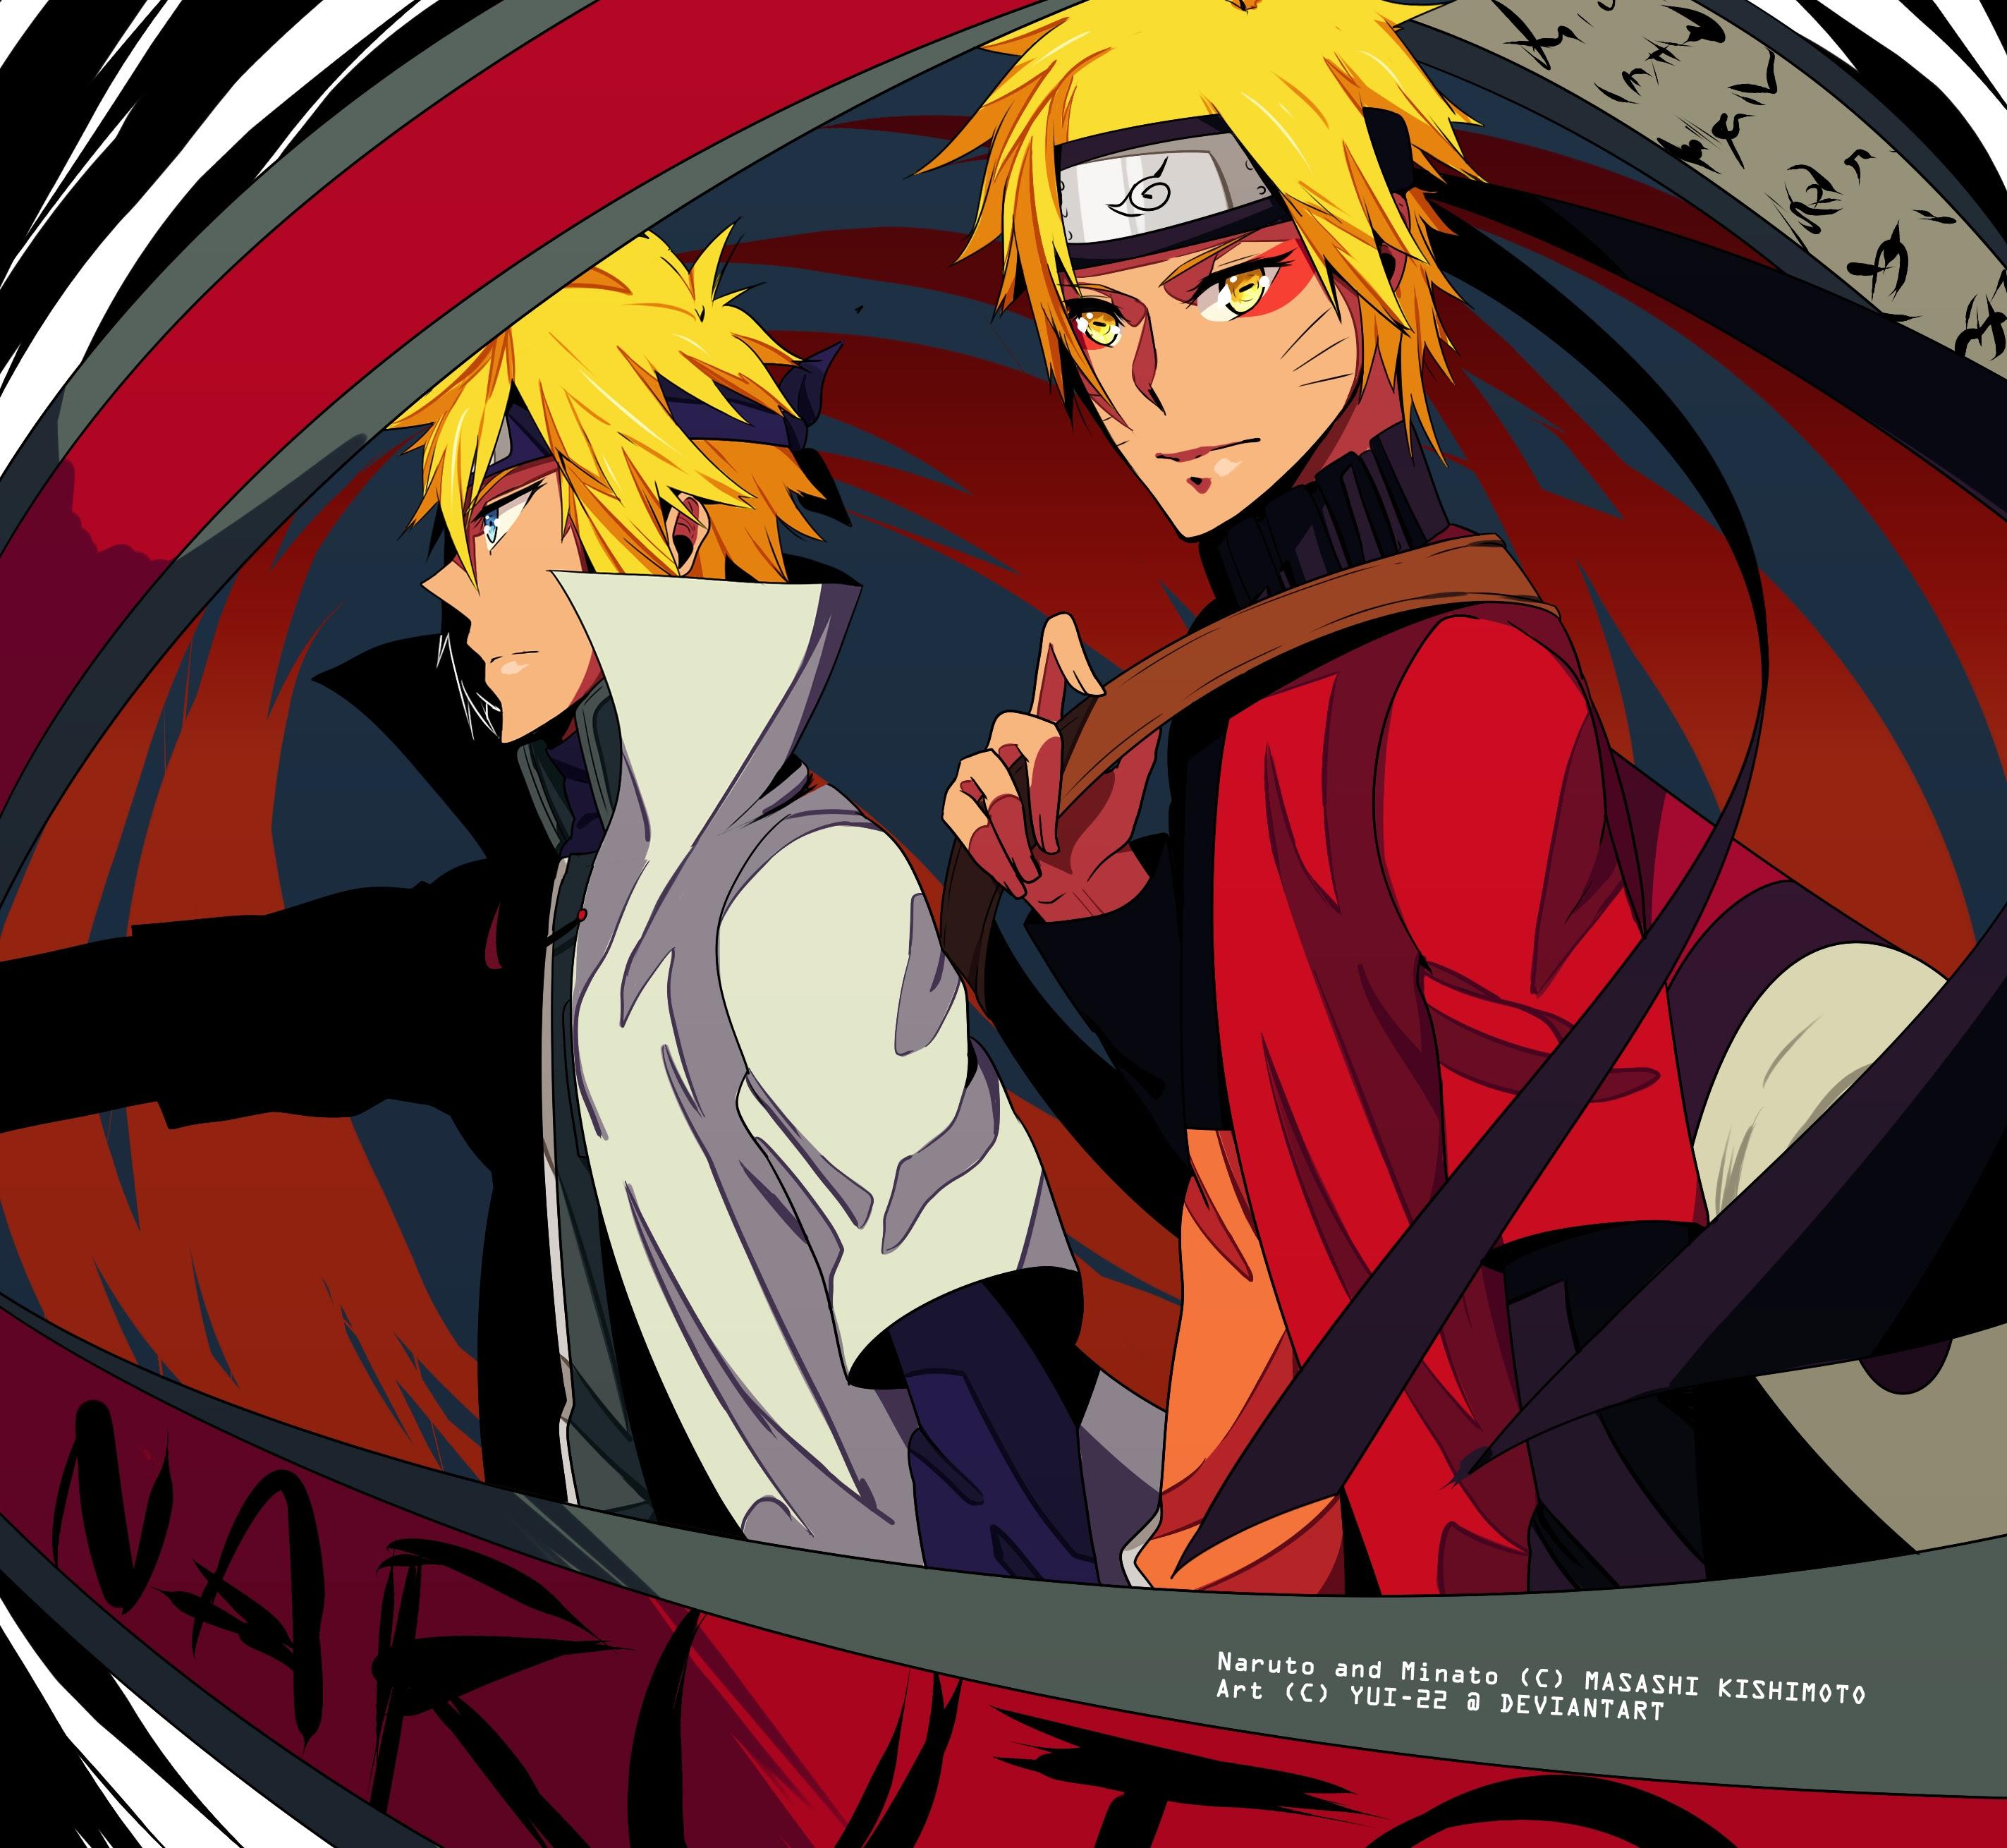 770 Koleksi Gambar-gambar Keren Naruto Shippuden Terbaru